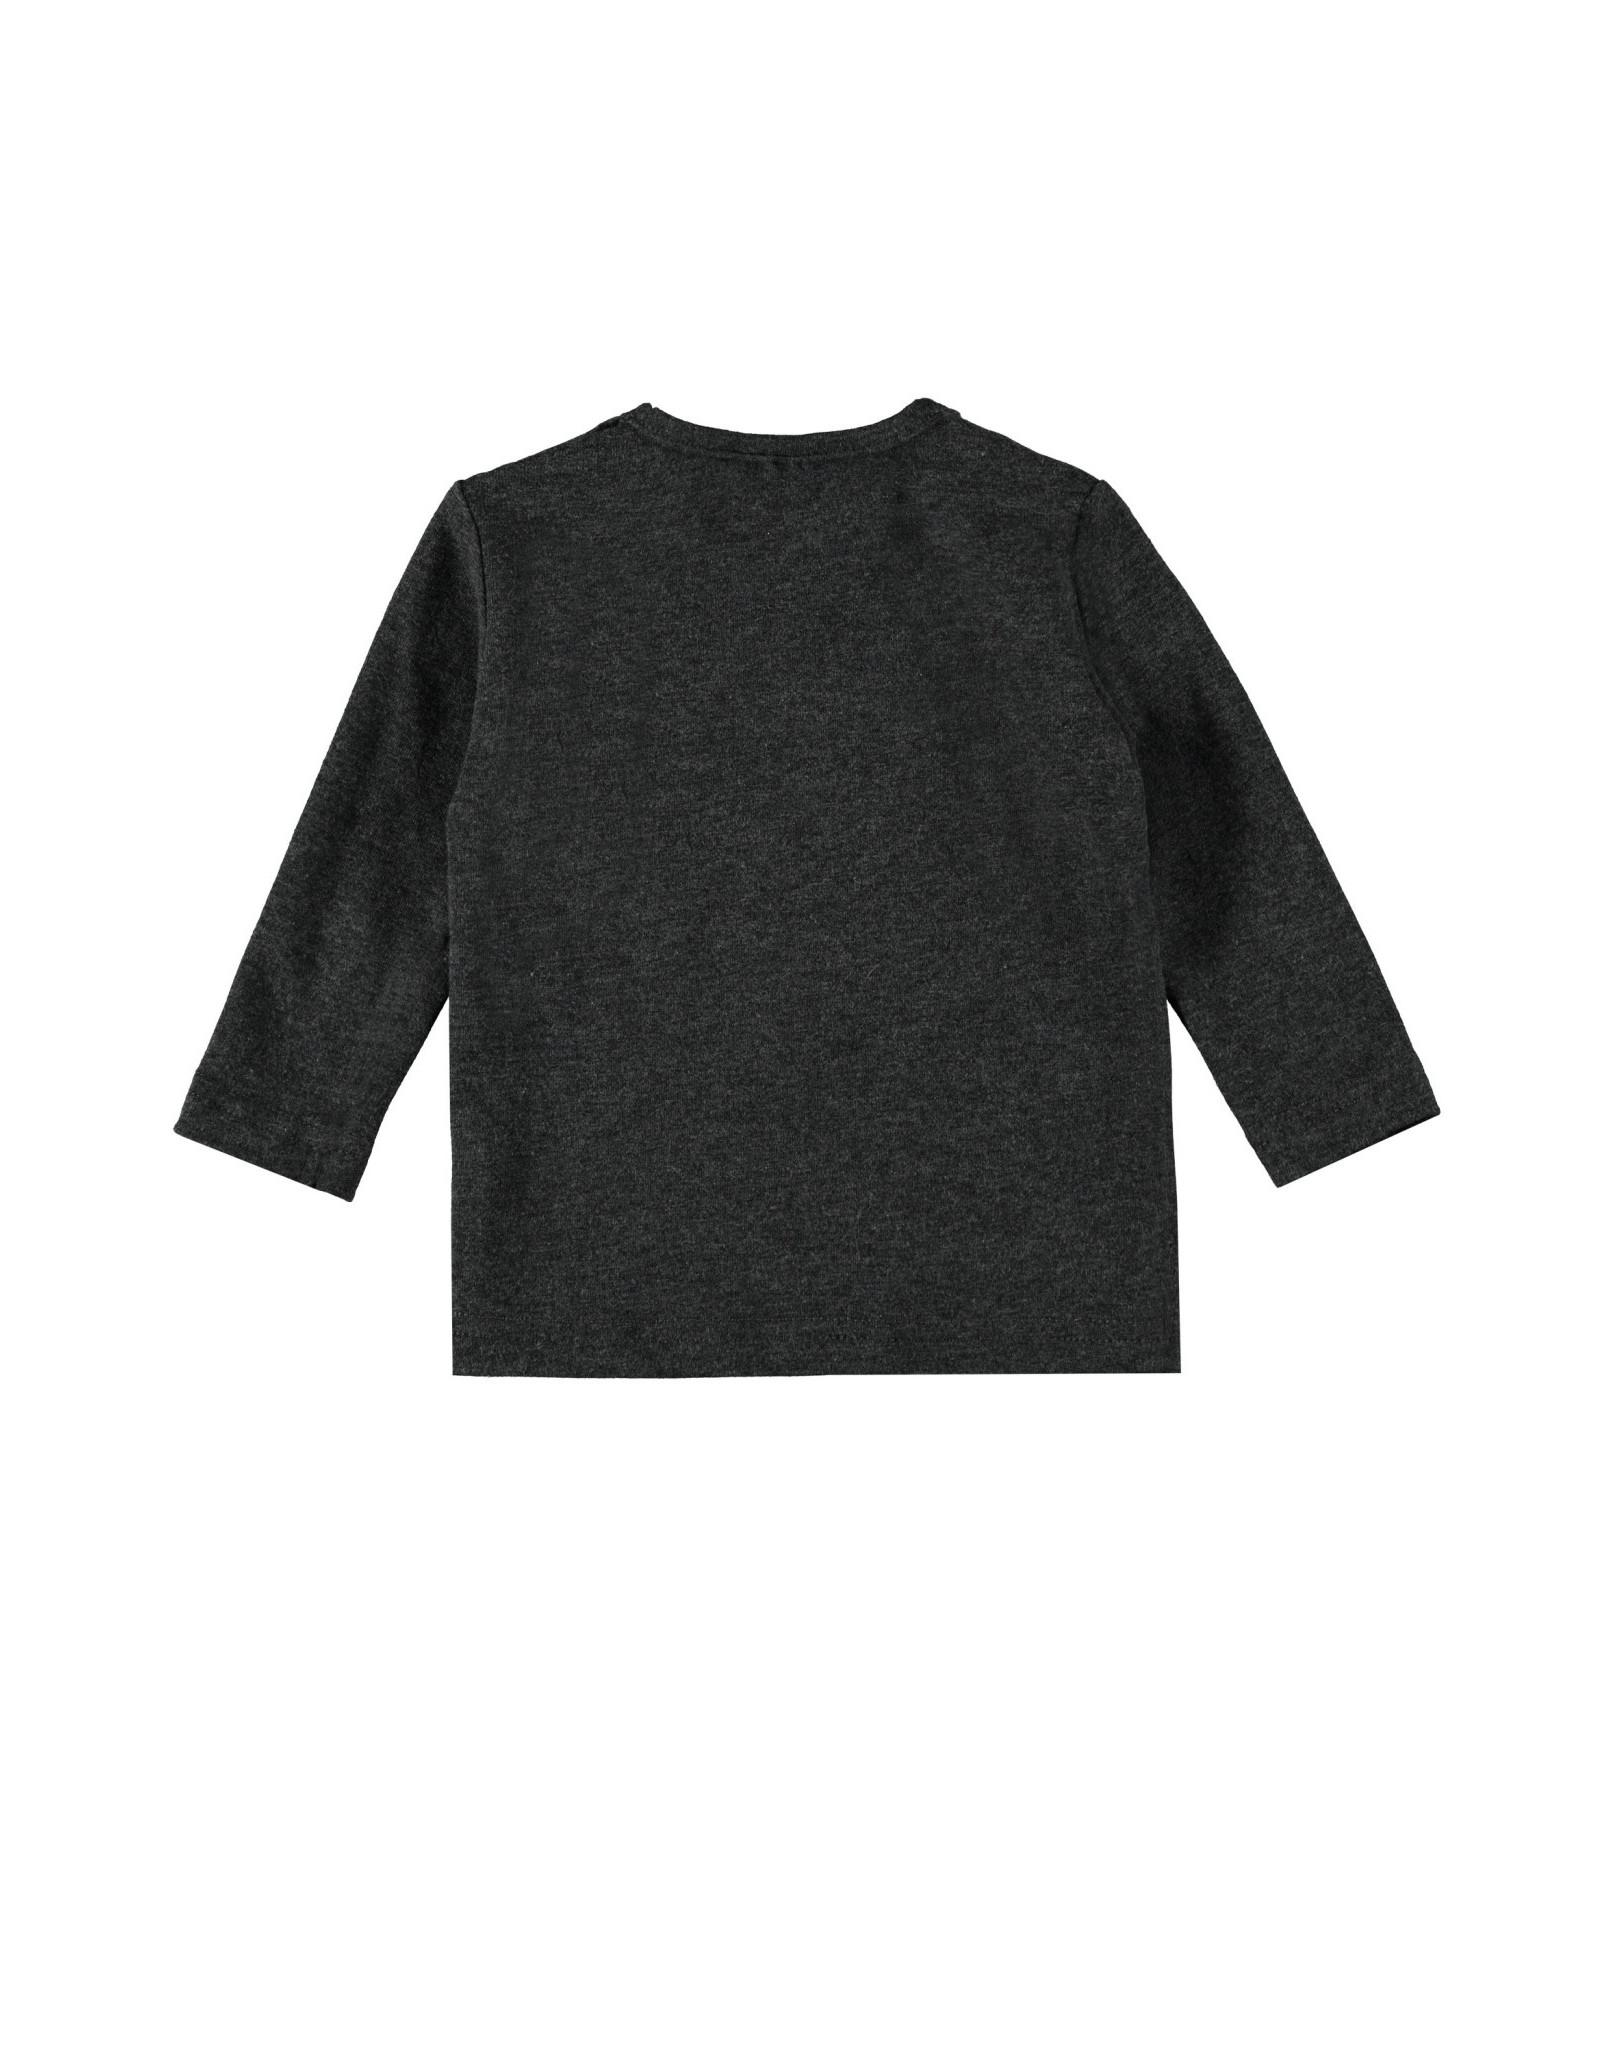 Bampidano Bampidano New Born jongens shirt Brandon Free Hugs Anthra Melee